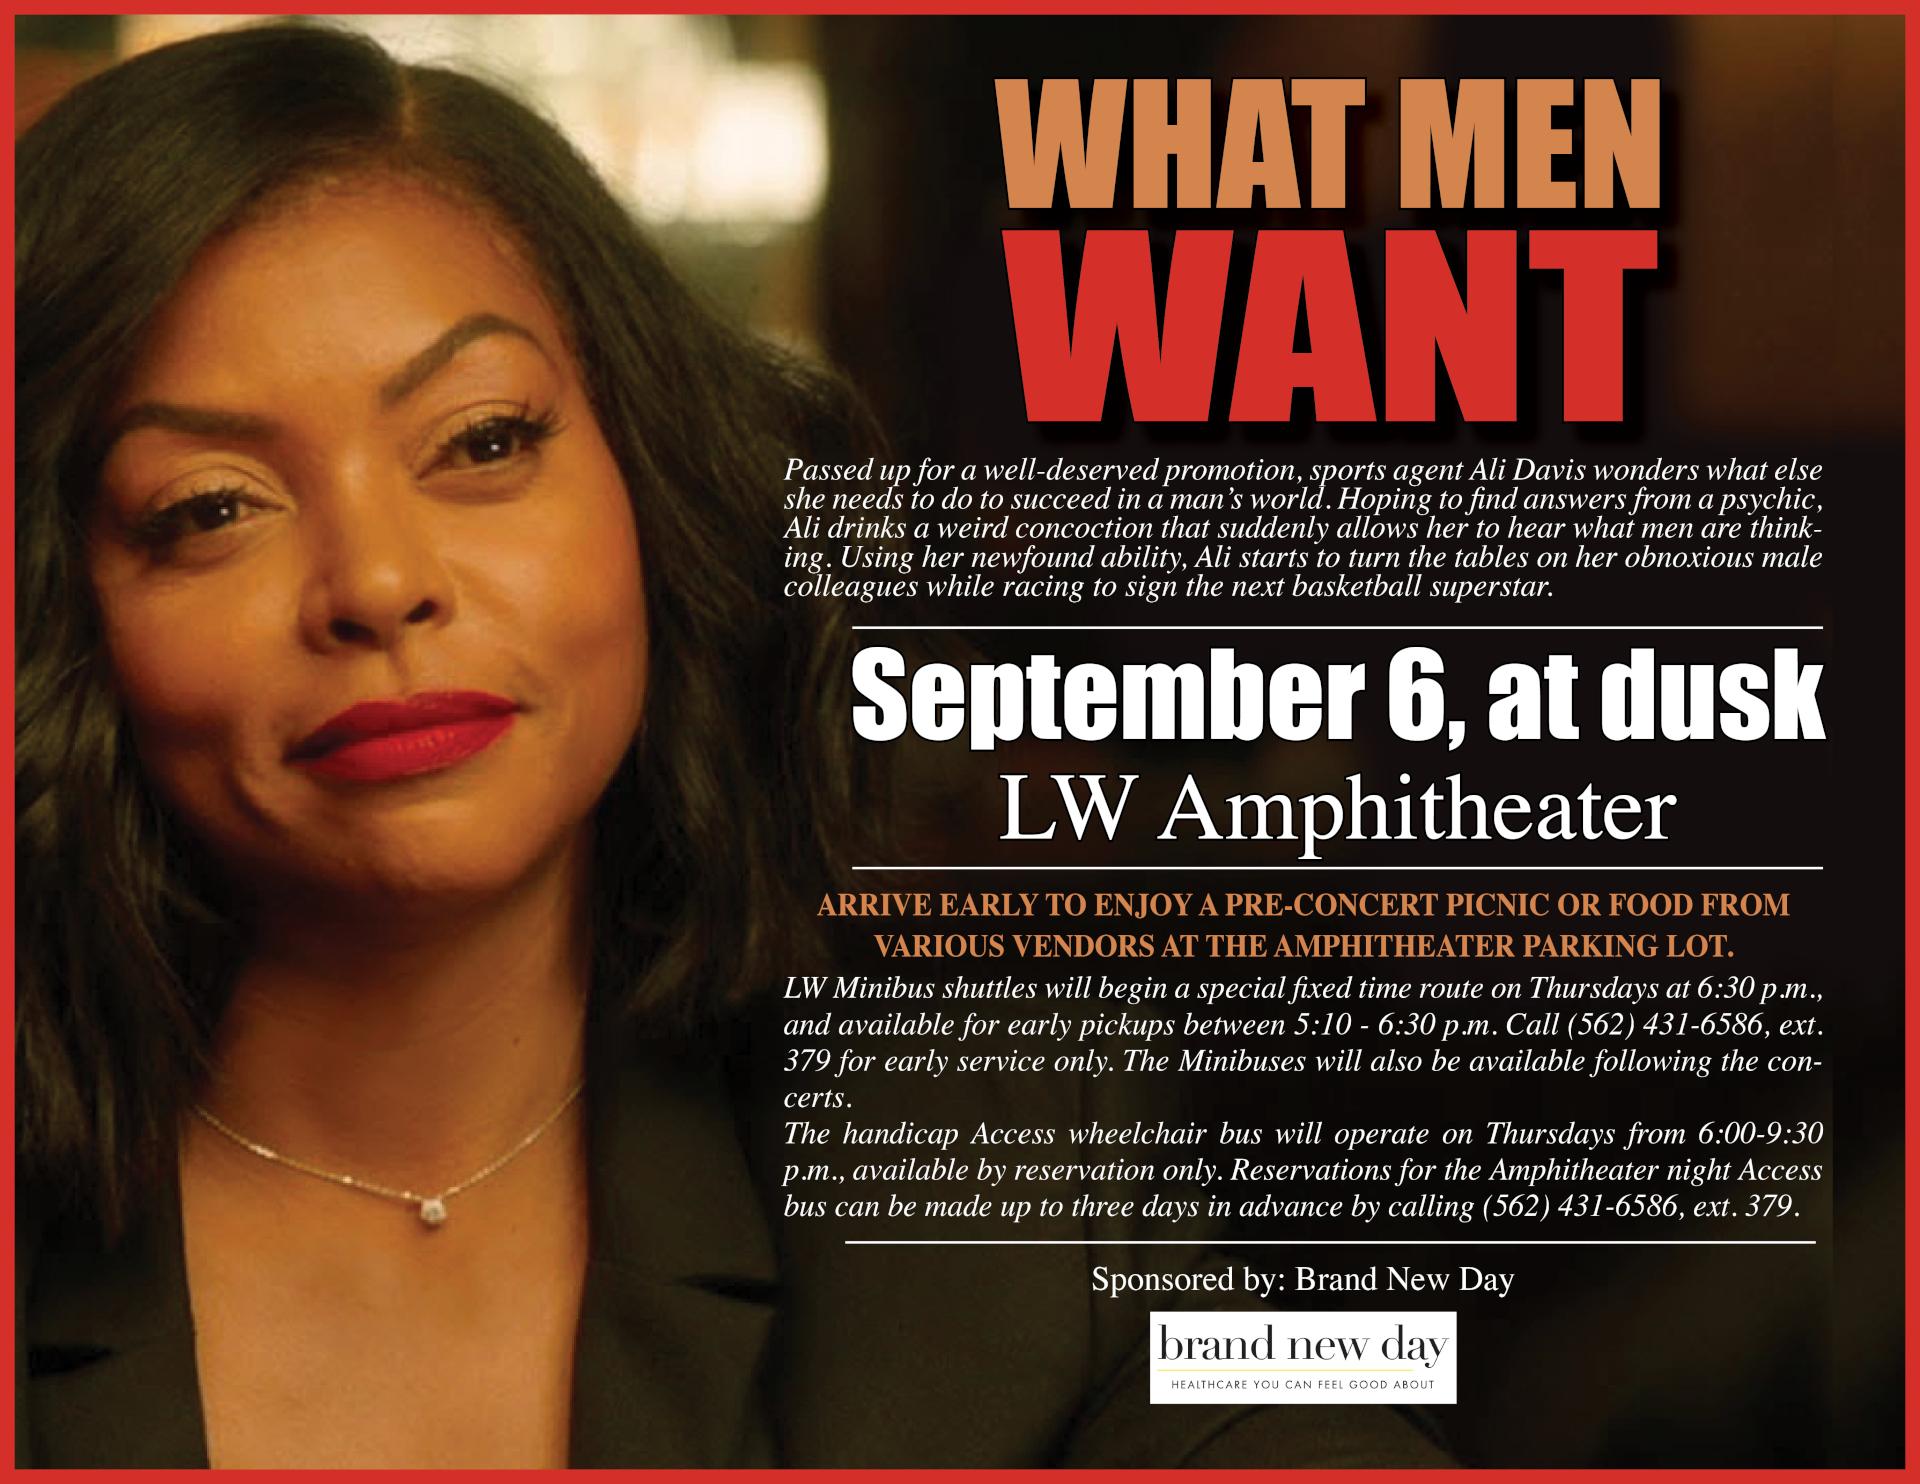 What men want flyer 09-06